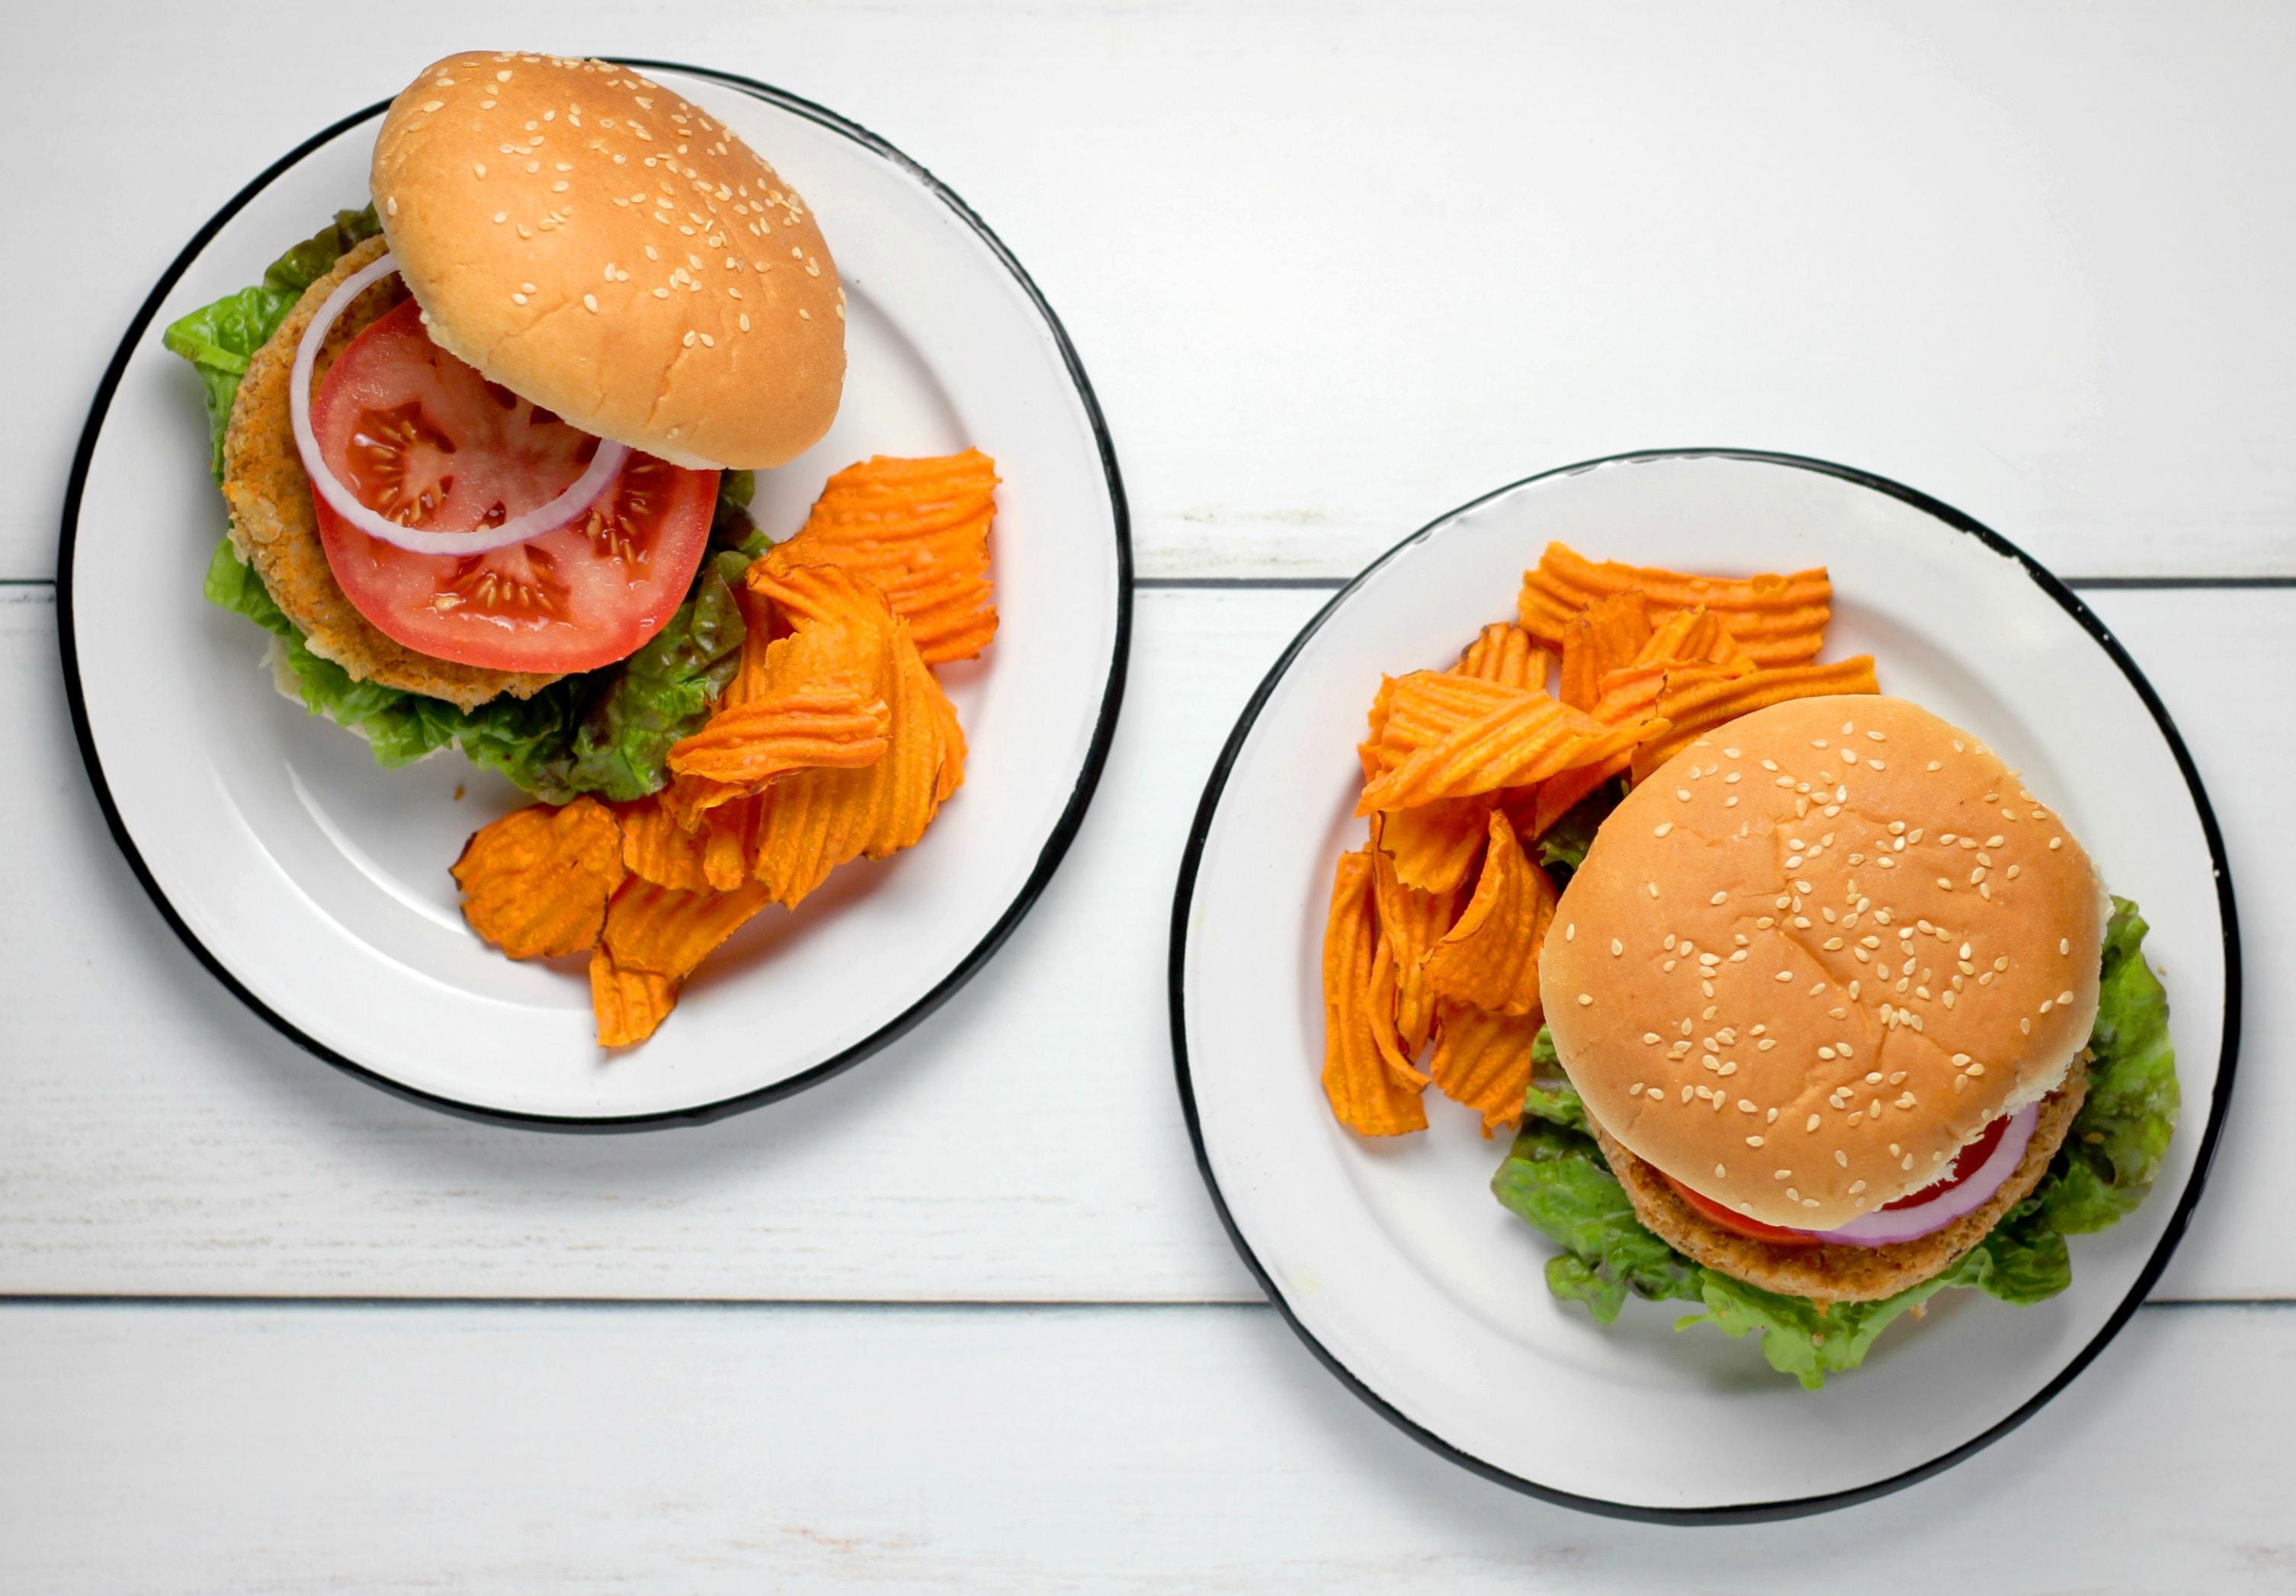 Vegan, Vegetarian, LocalBini, alternative, holiday, experience, local, authentic, Europe, Travel, Travel tips, travel blog, vacation, traditional, food, foodie, backpack, Tibits, Buffet, veggie, haus hitl, roots, samses, market kitchen, marktkuche, david & david, beetnut, veggieburger, food, dinner, lunch, meal, salad, sandwich, gourmet, restaurant, café, schnitzel, fondue, eatery, truffle, smoothie, protein, bowl, plant based, dessert, carnivore, herbivore, tofu